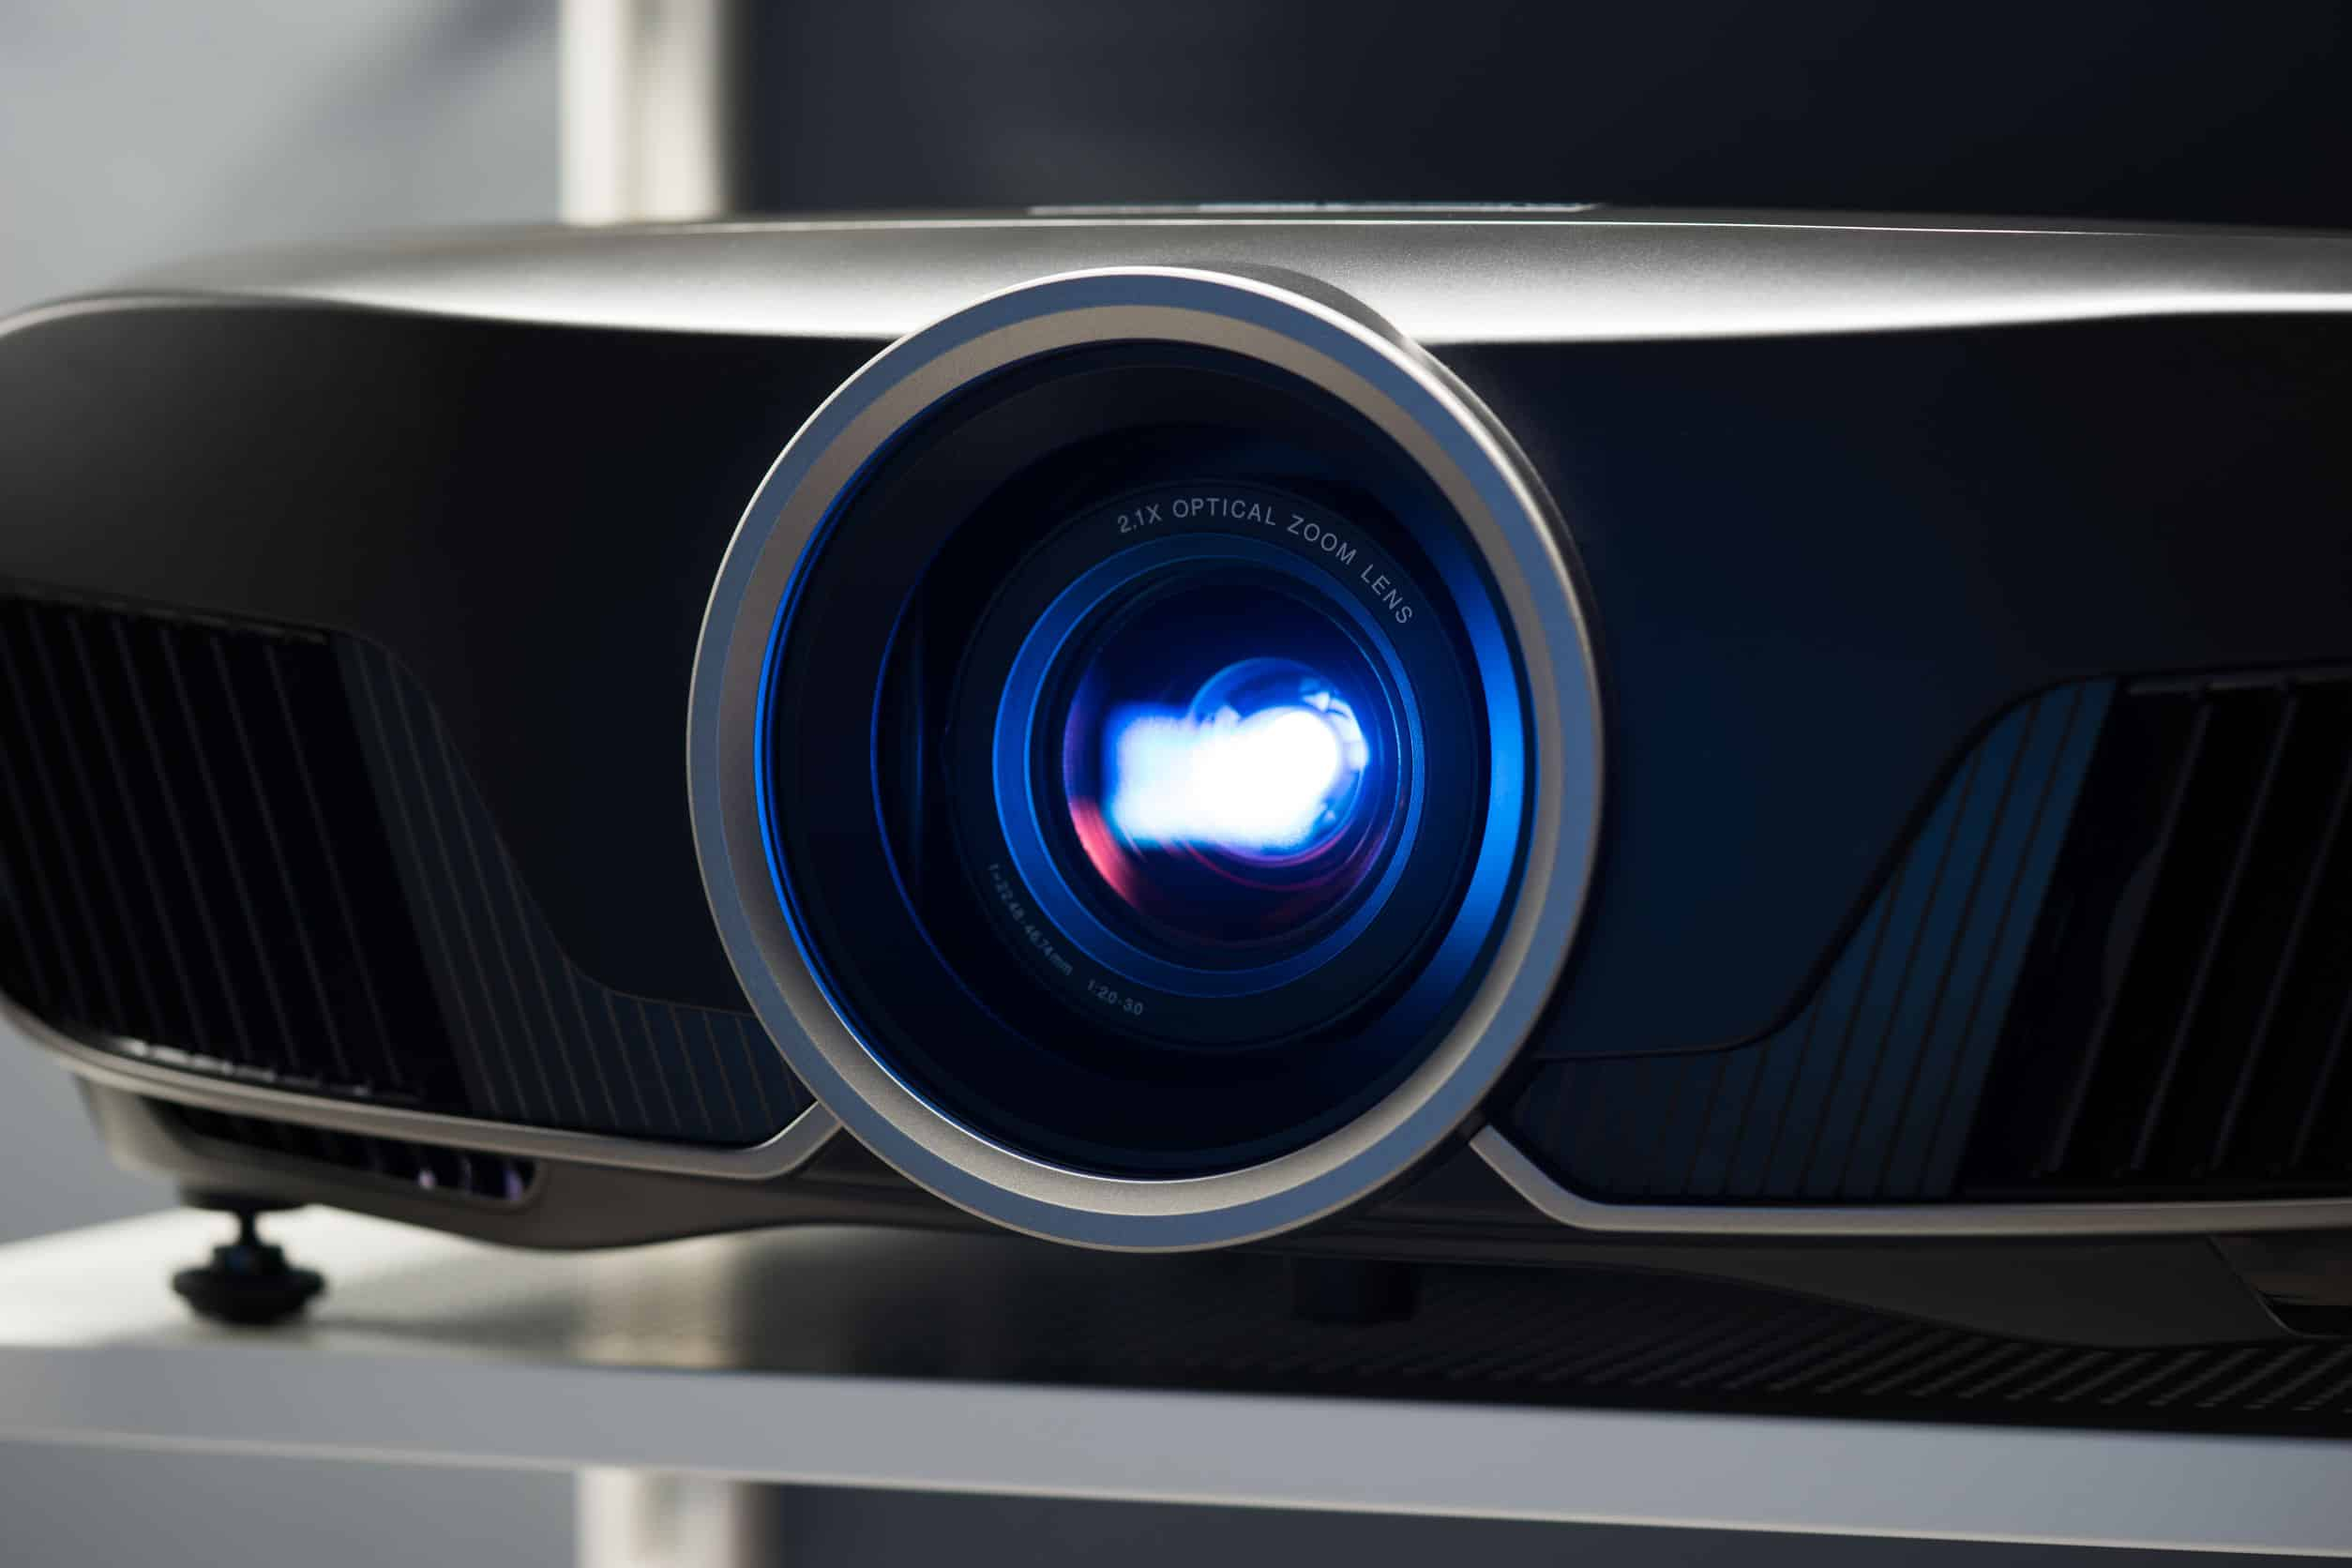 Proyector 3D: ¿Cuál es el mejor del 2020?